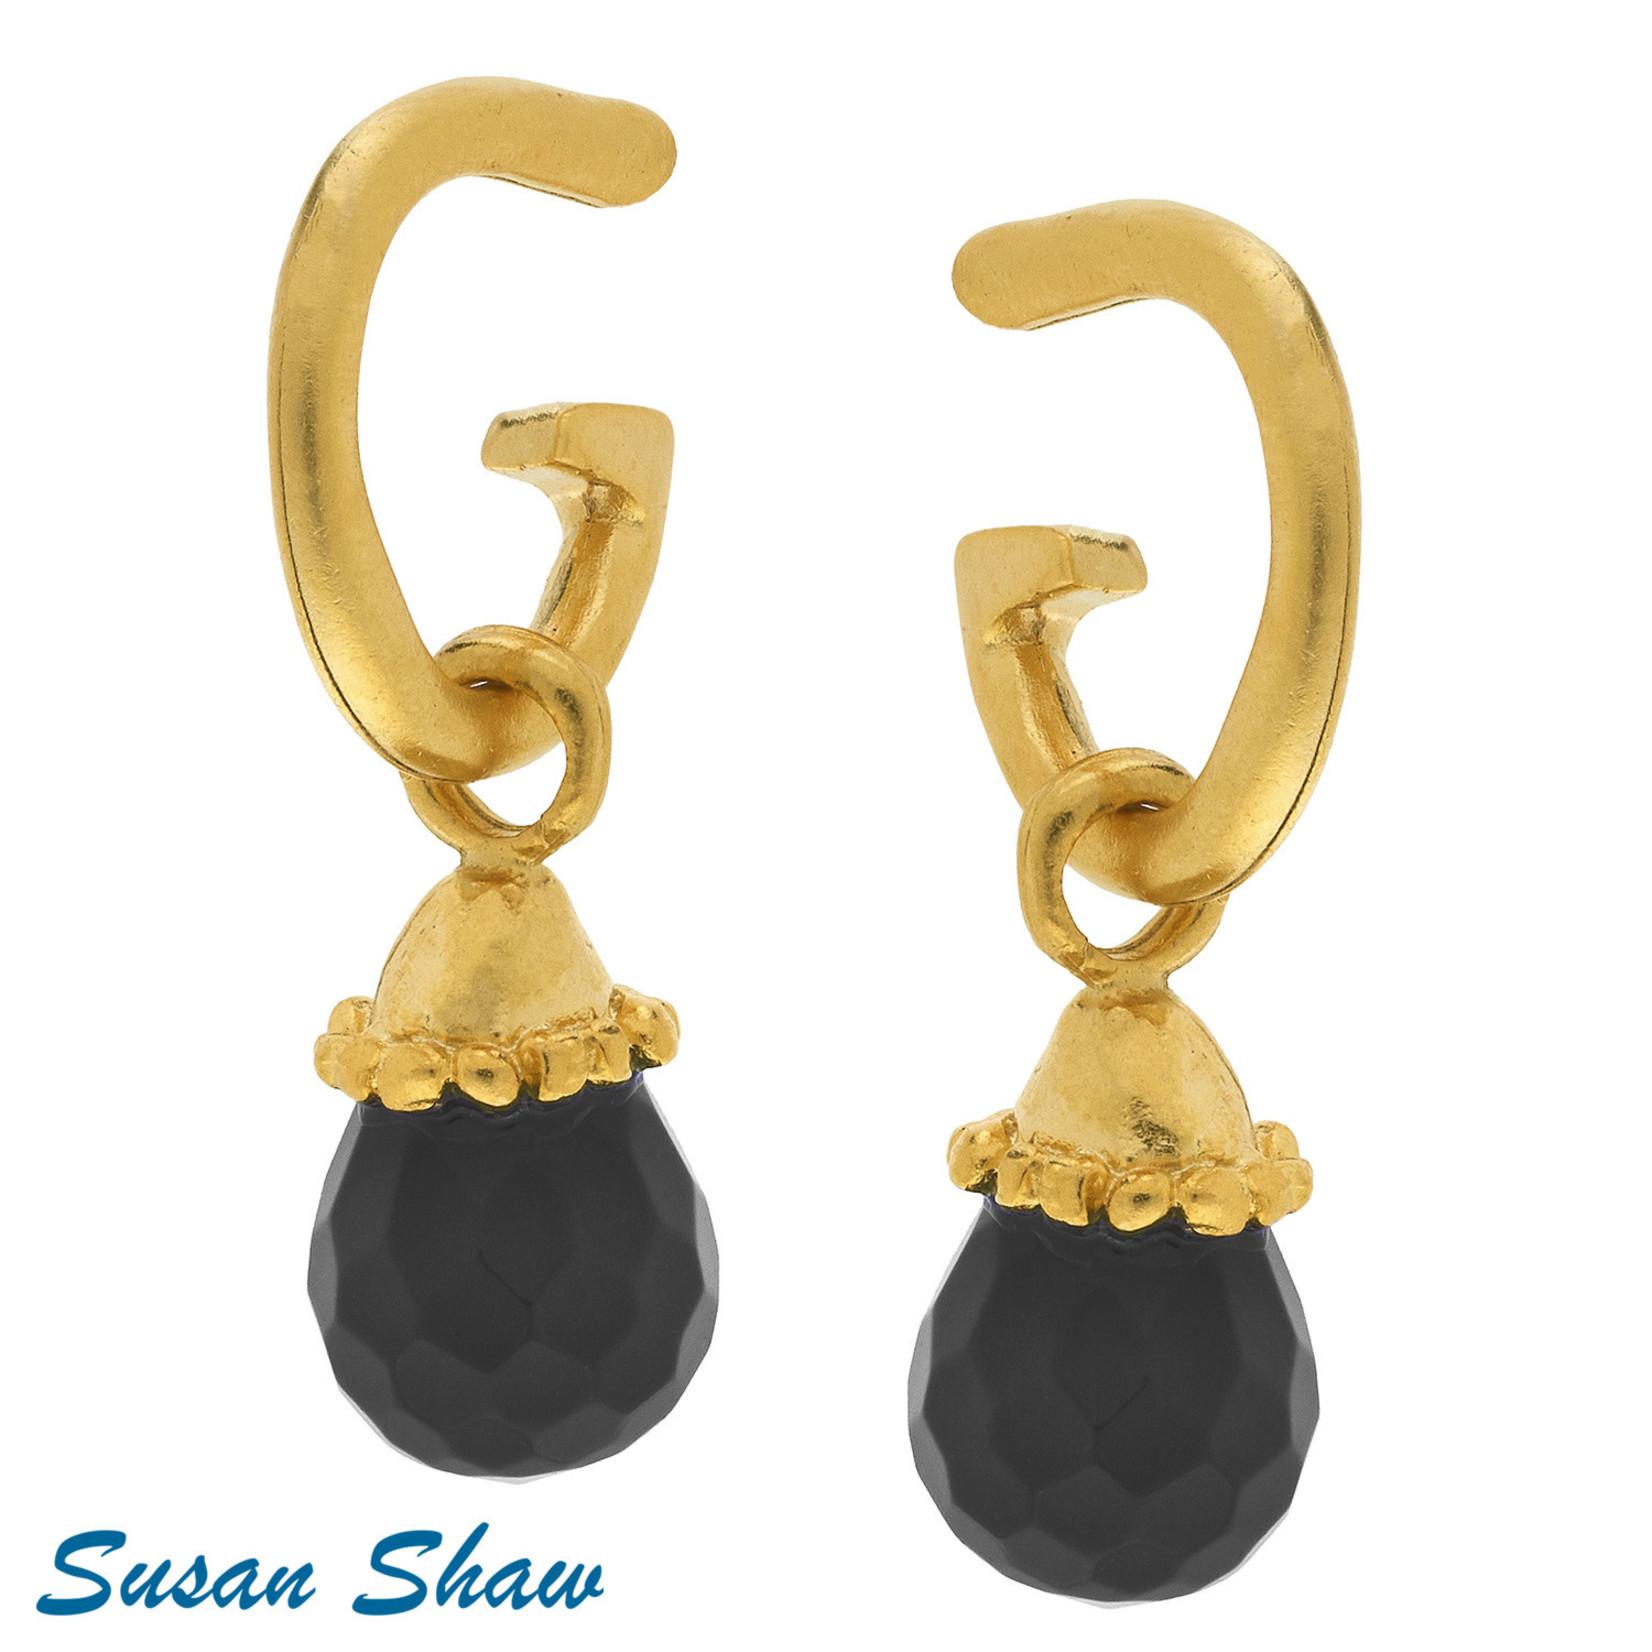 Susan Shaw Susan Shaw Black Quartz Earring